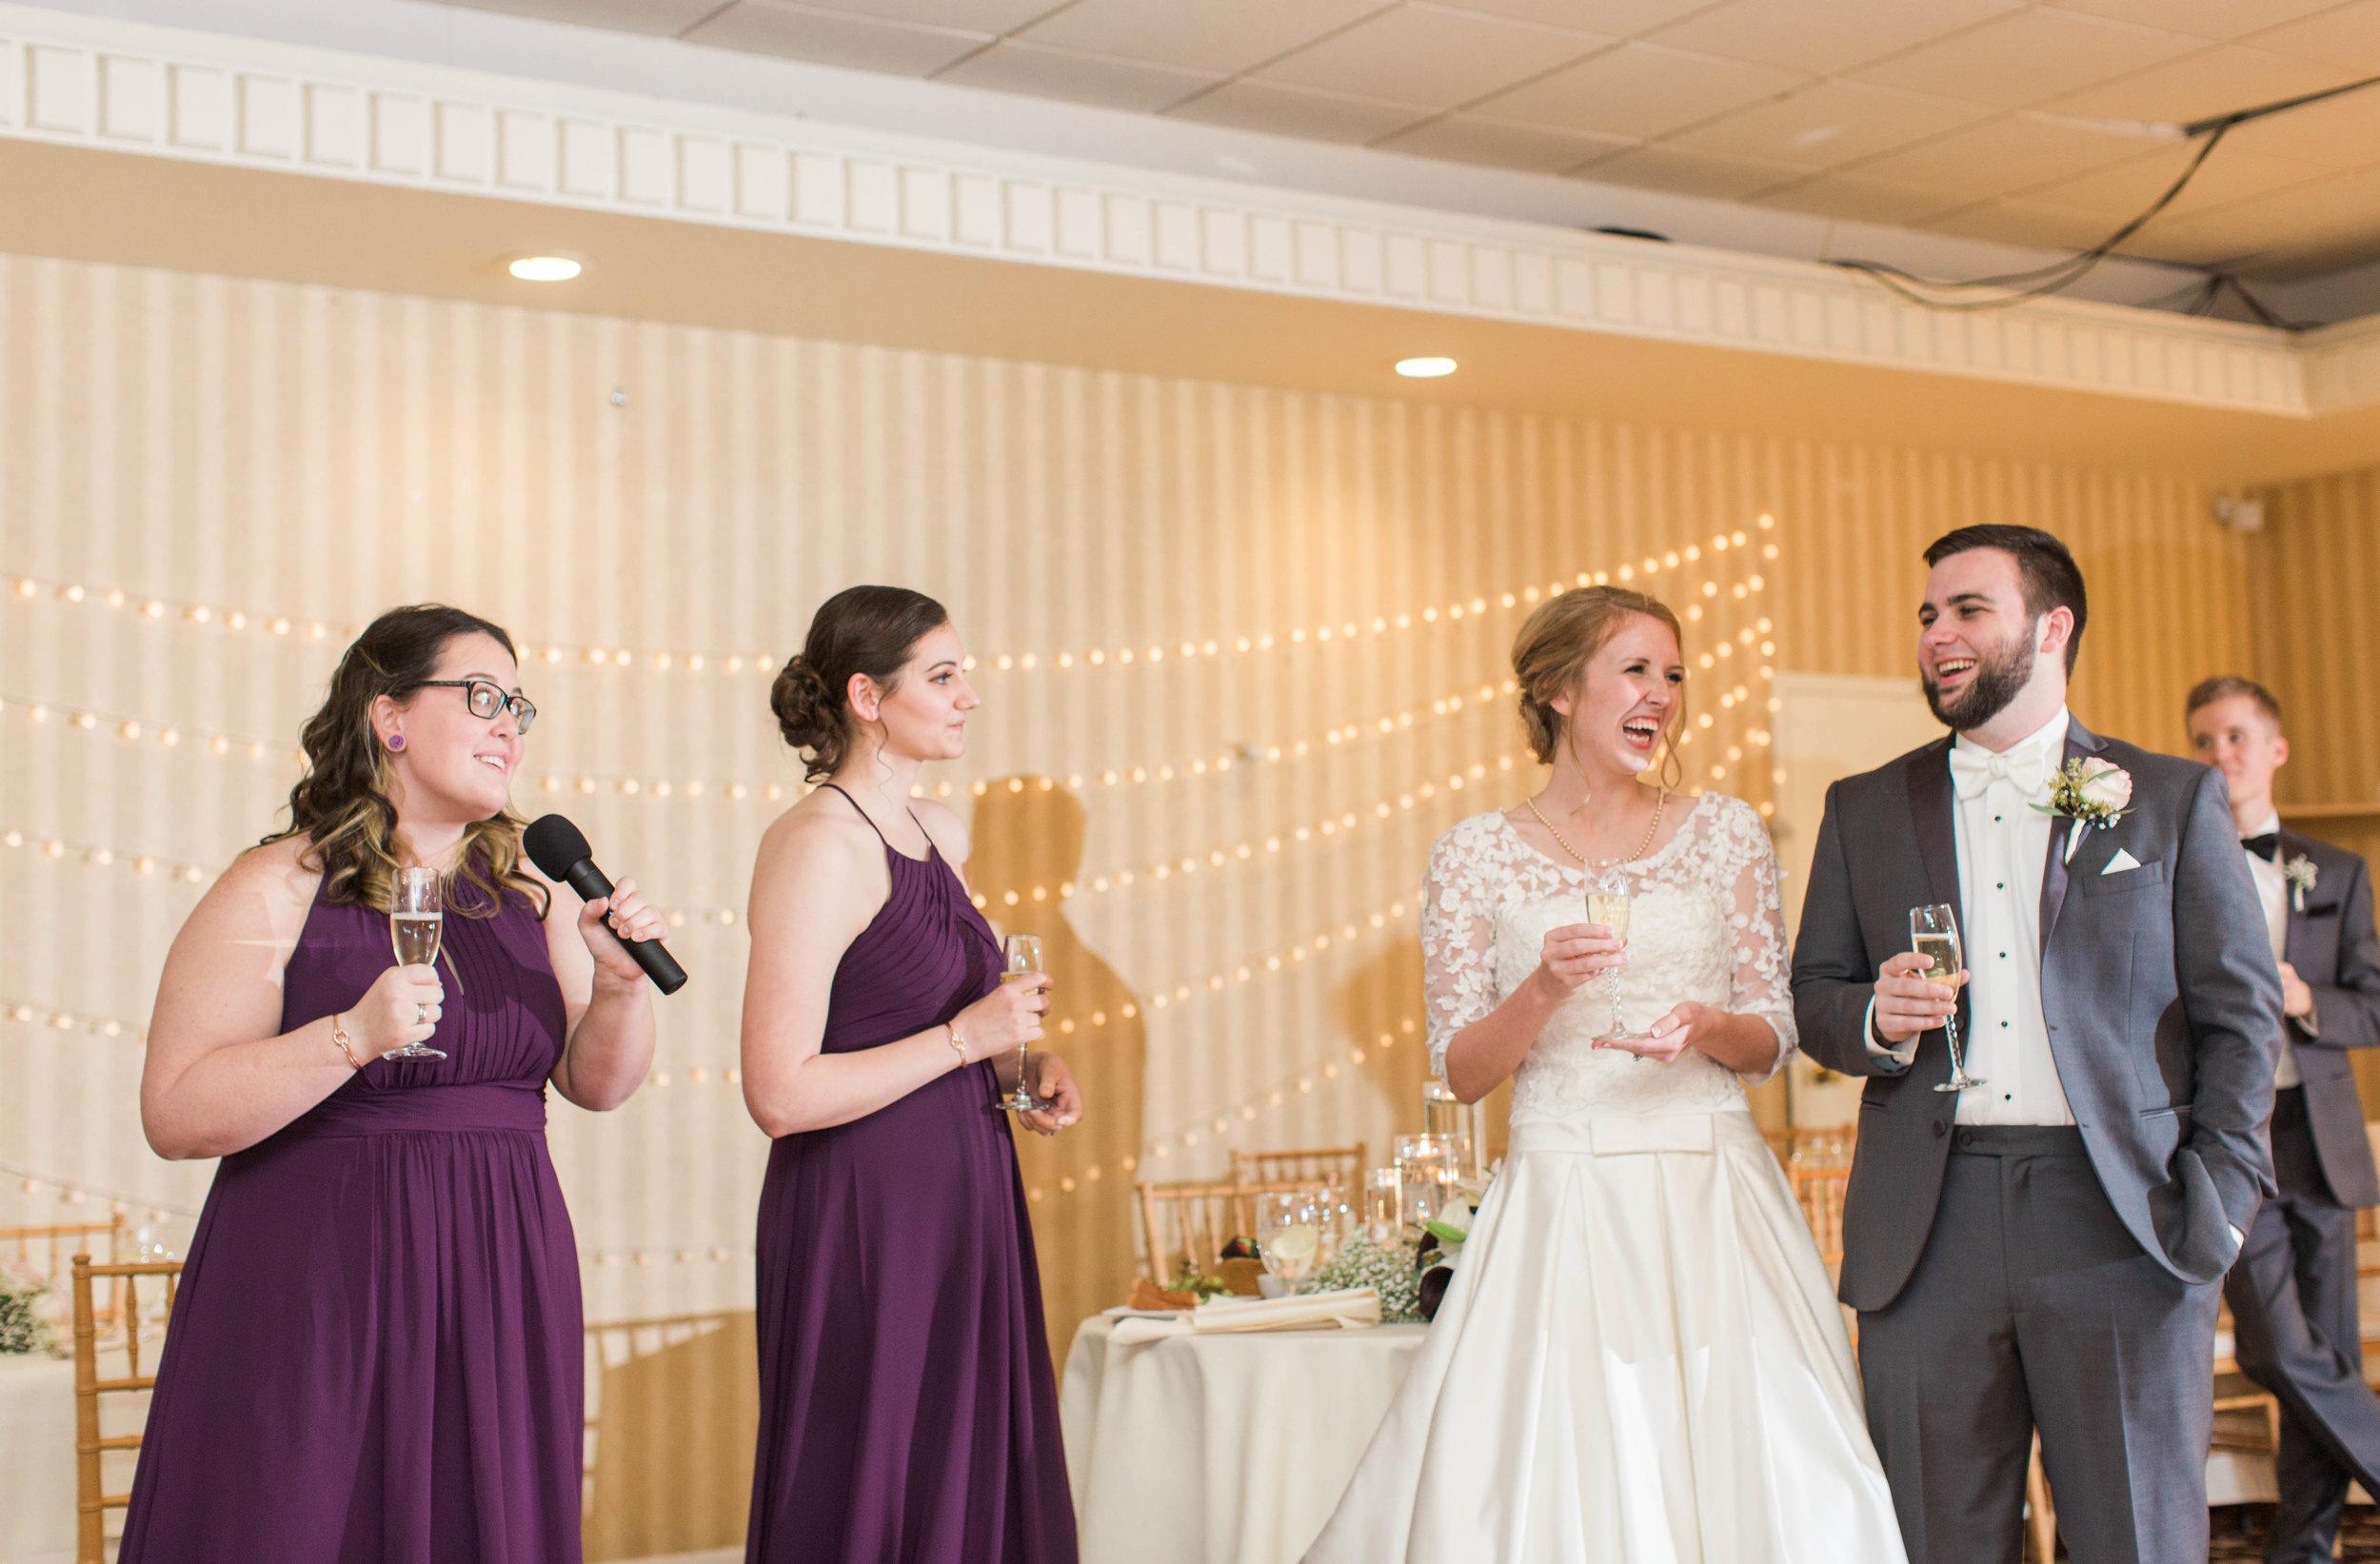 Beaumont Texas Country Club wedding-6207.jpg